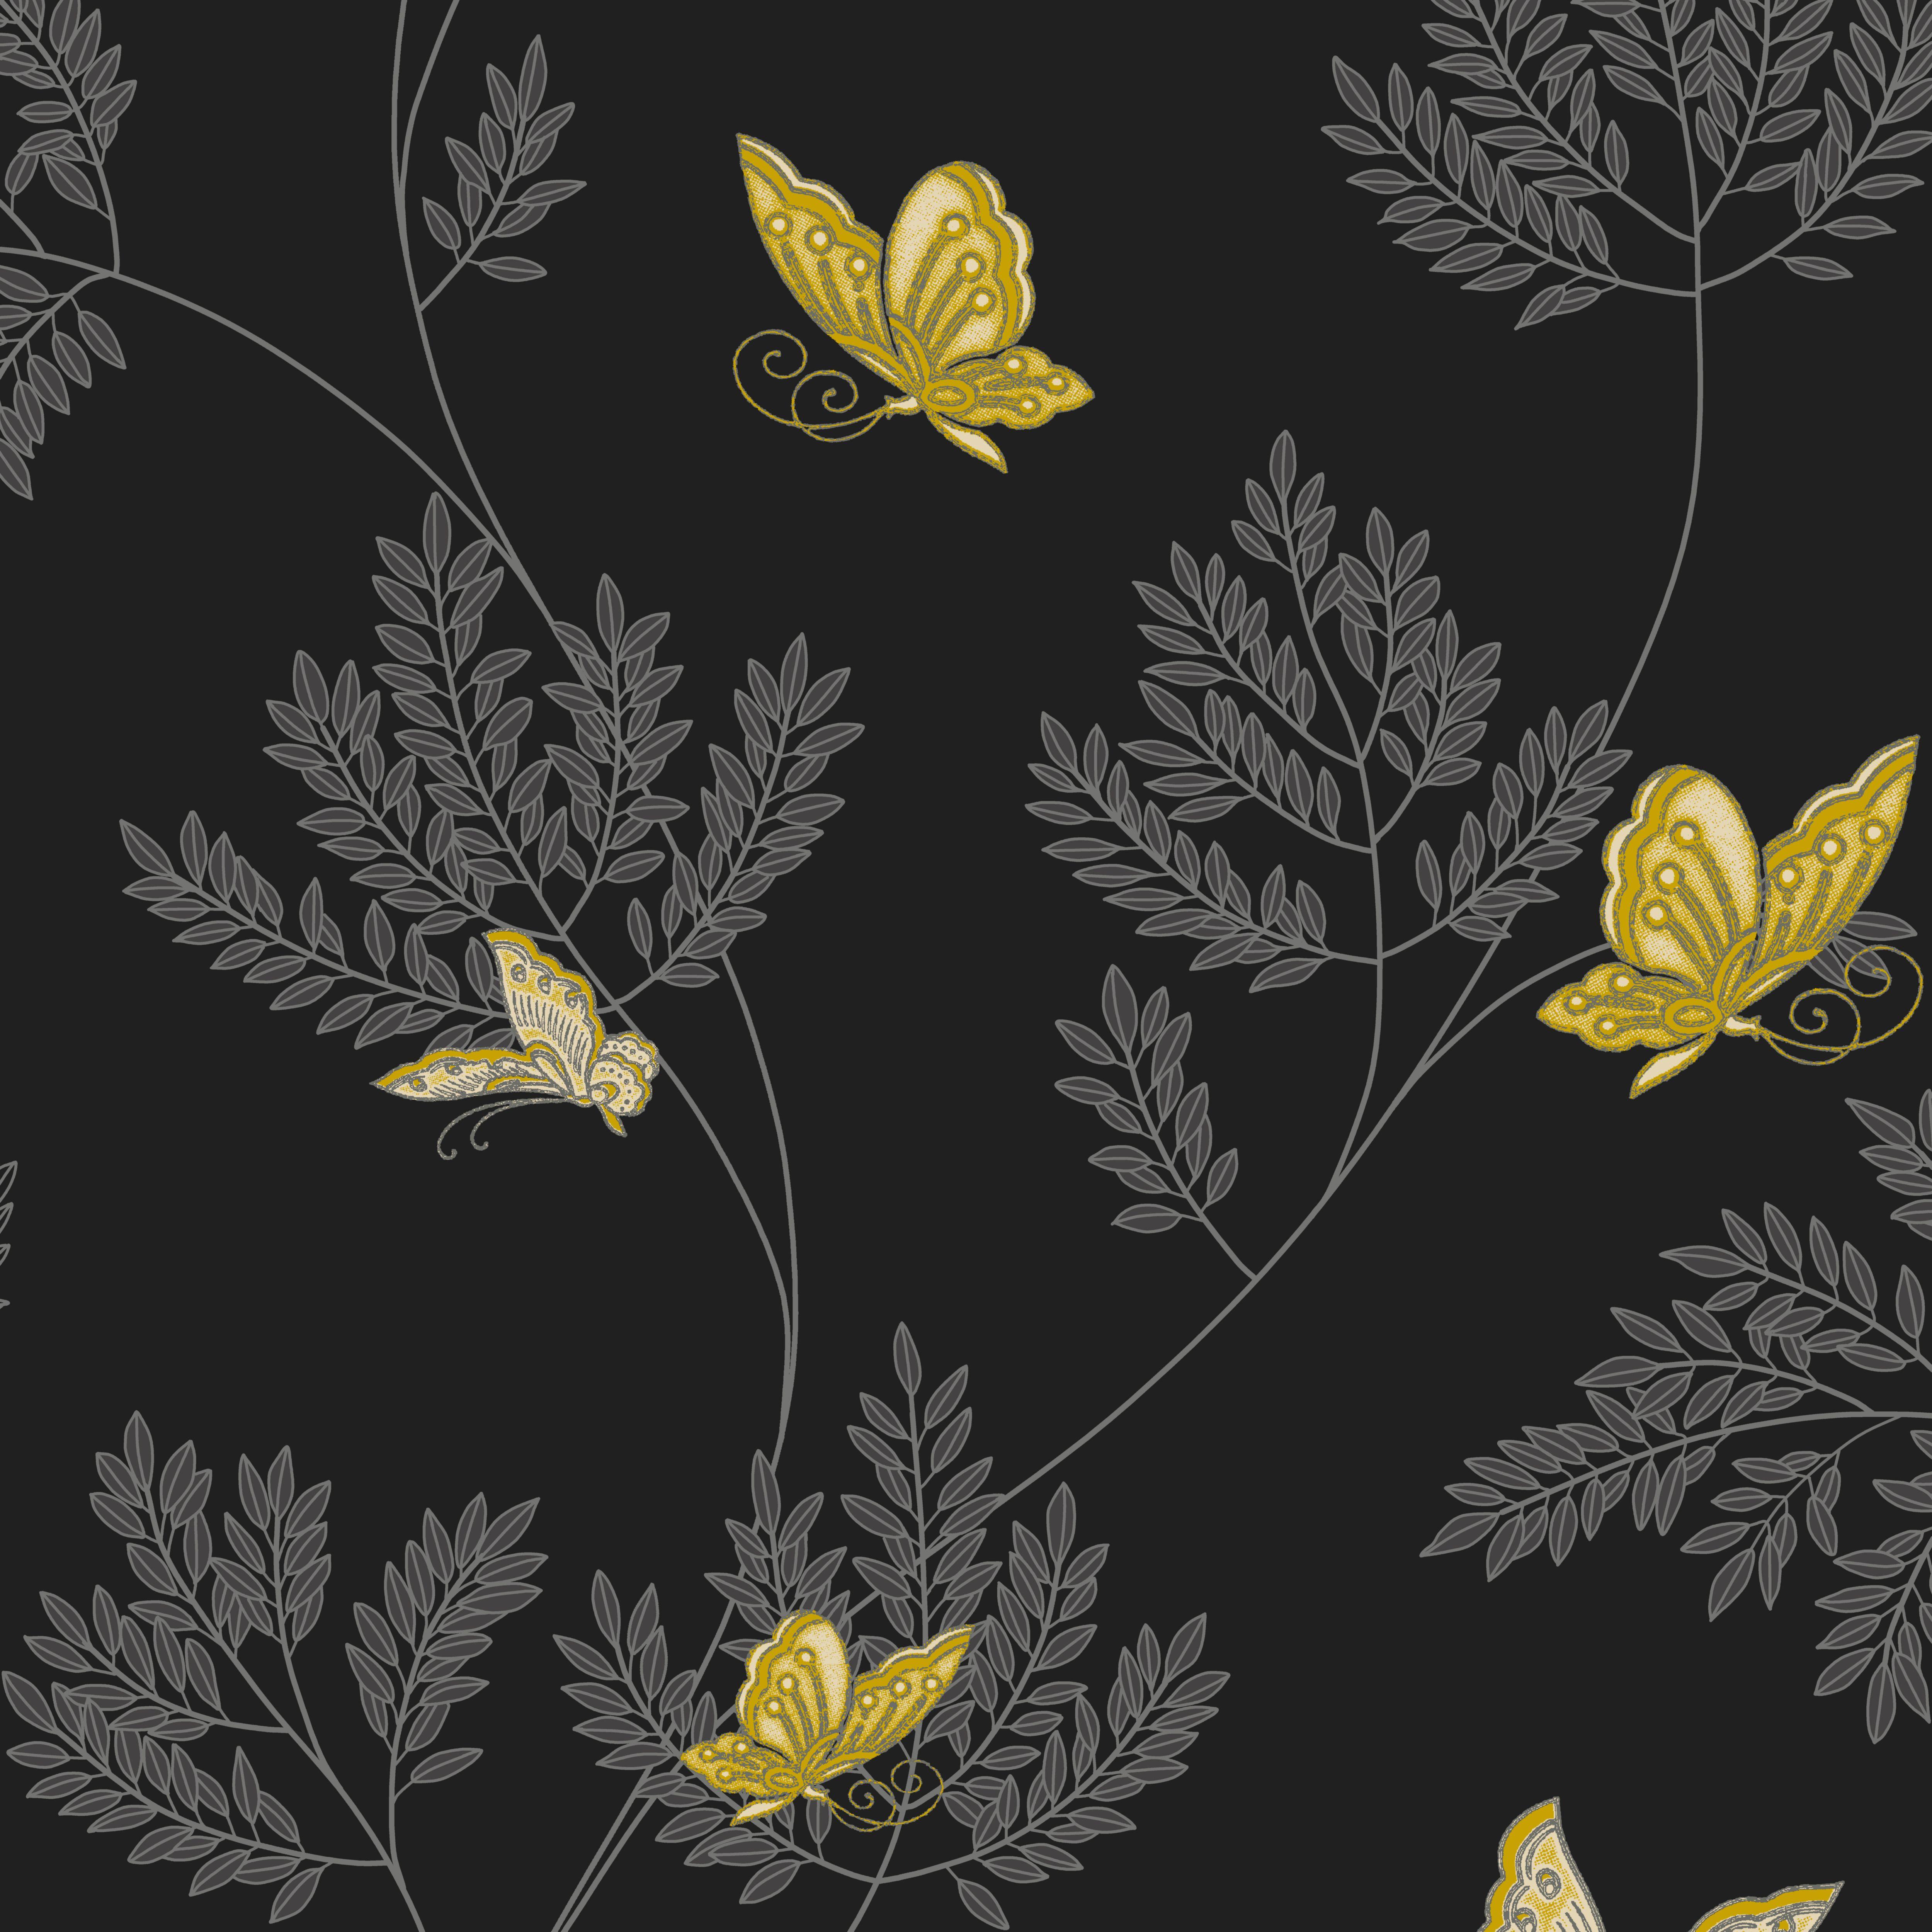 Opera Hermione Black Grey Yellow Floral Butterflies Wallpaper